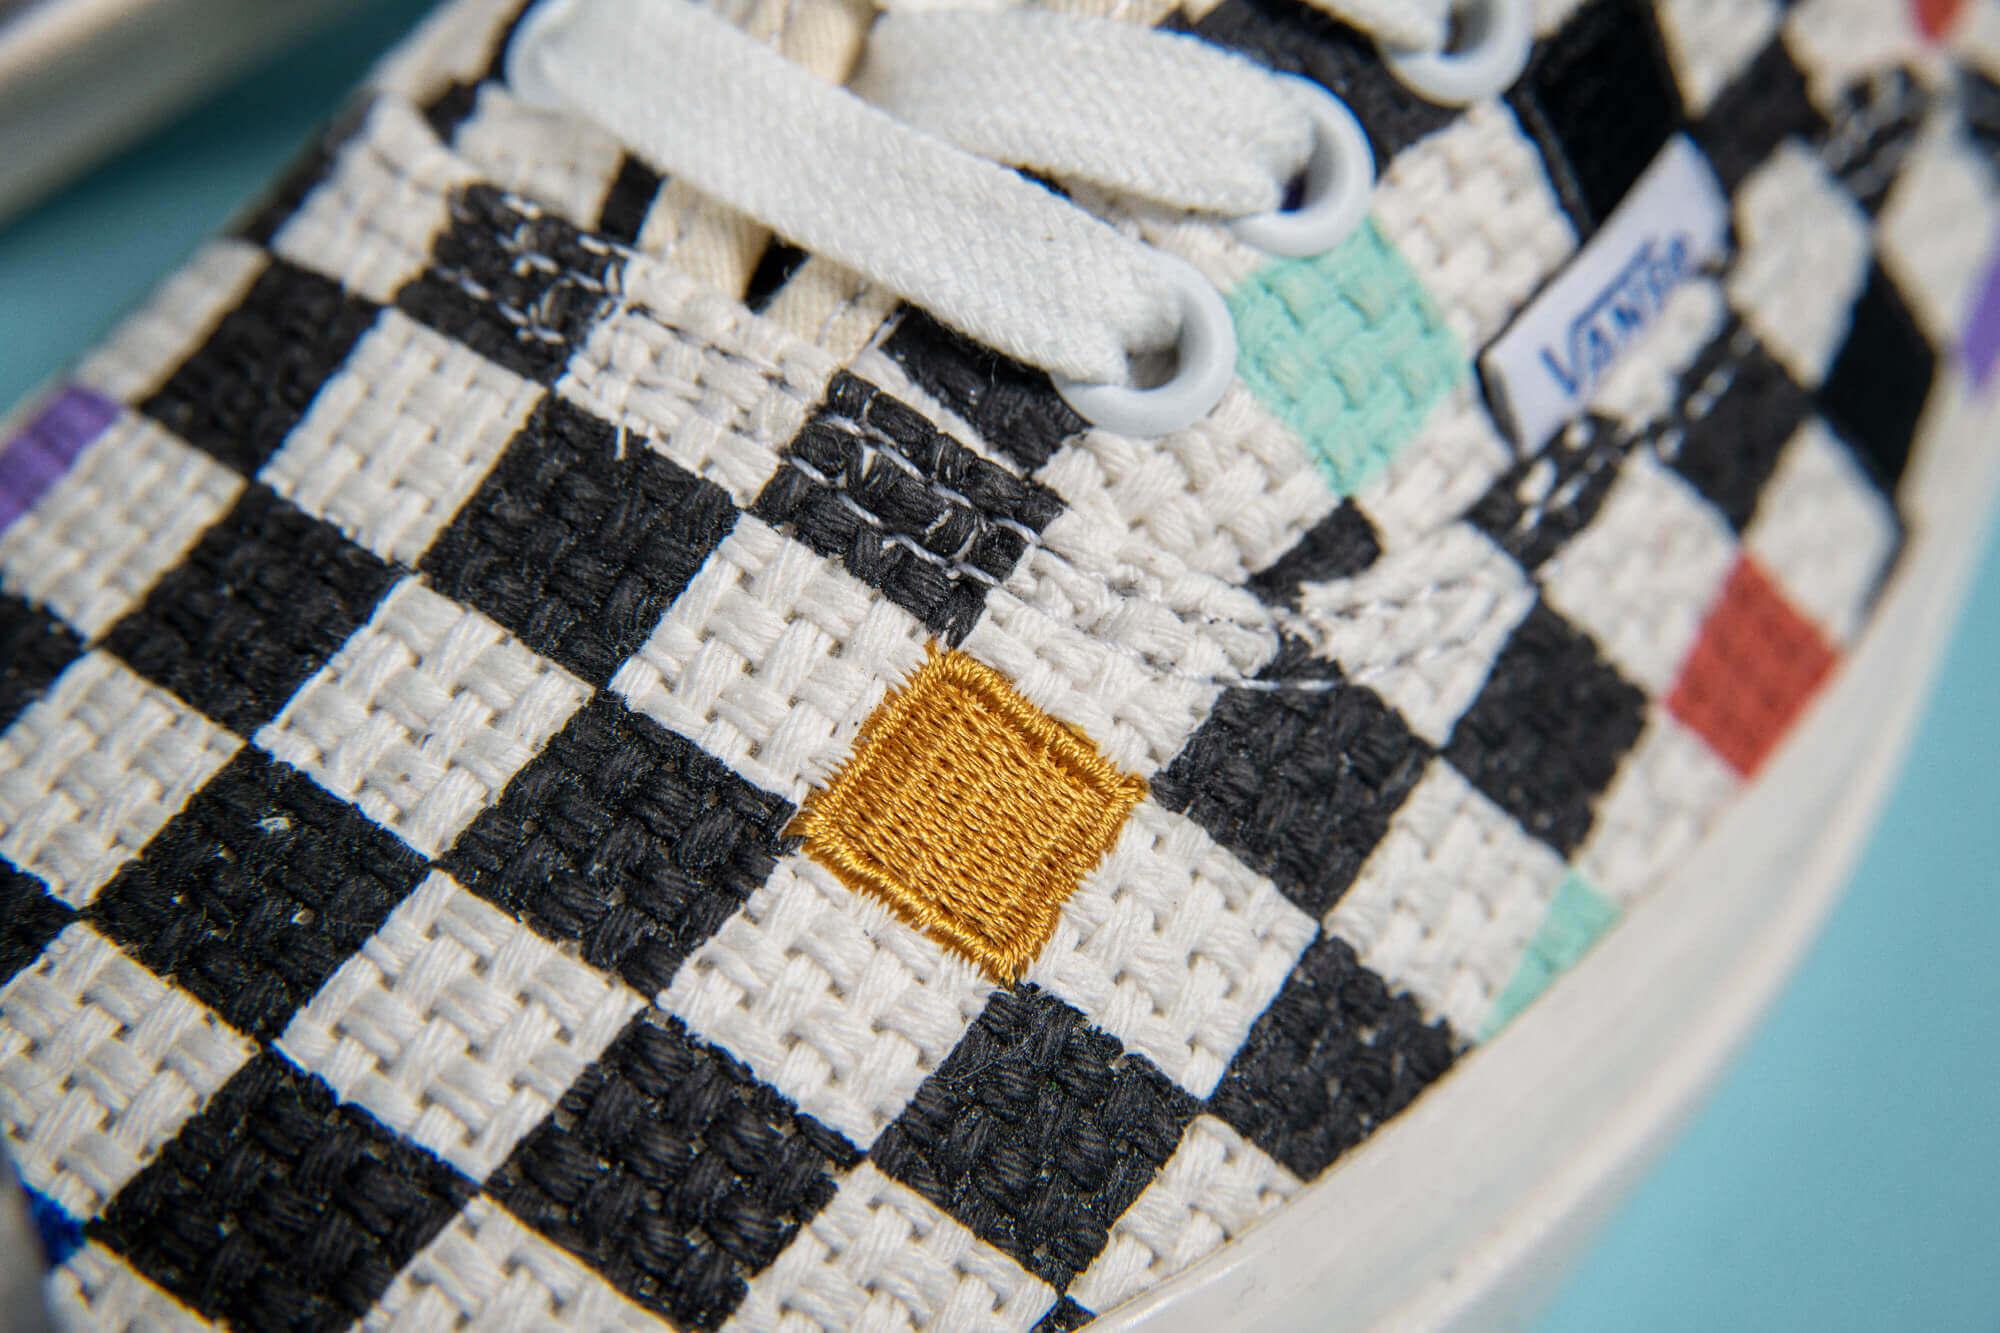 details checkerboard toe box - Vans - Anaheim Factory - Needlework Collection - Authentic 44DX